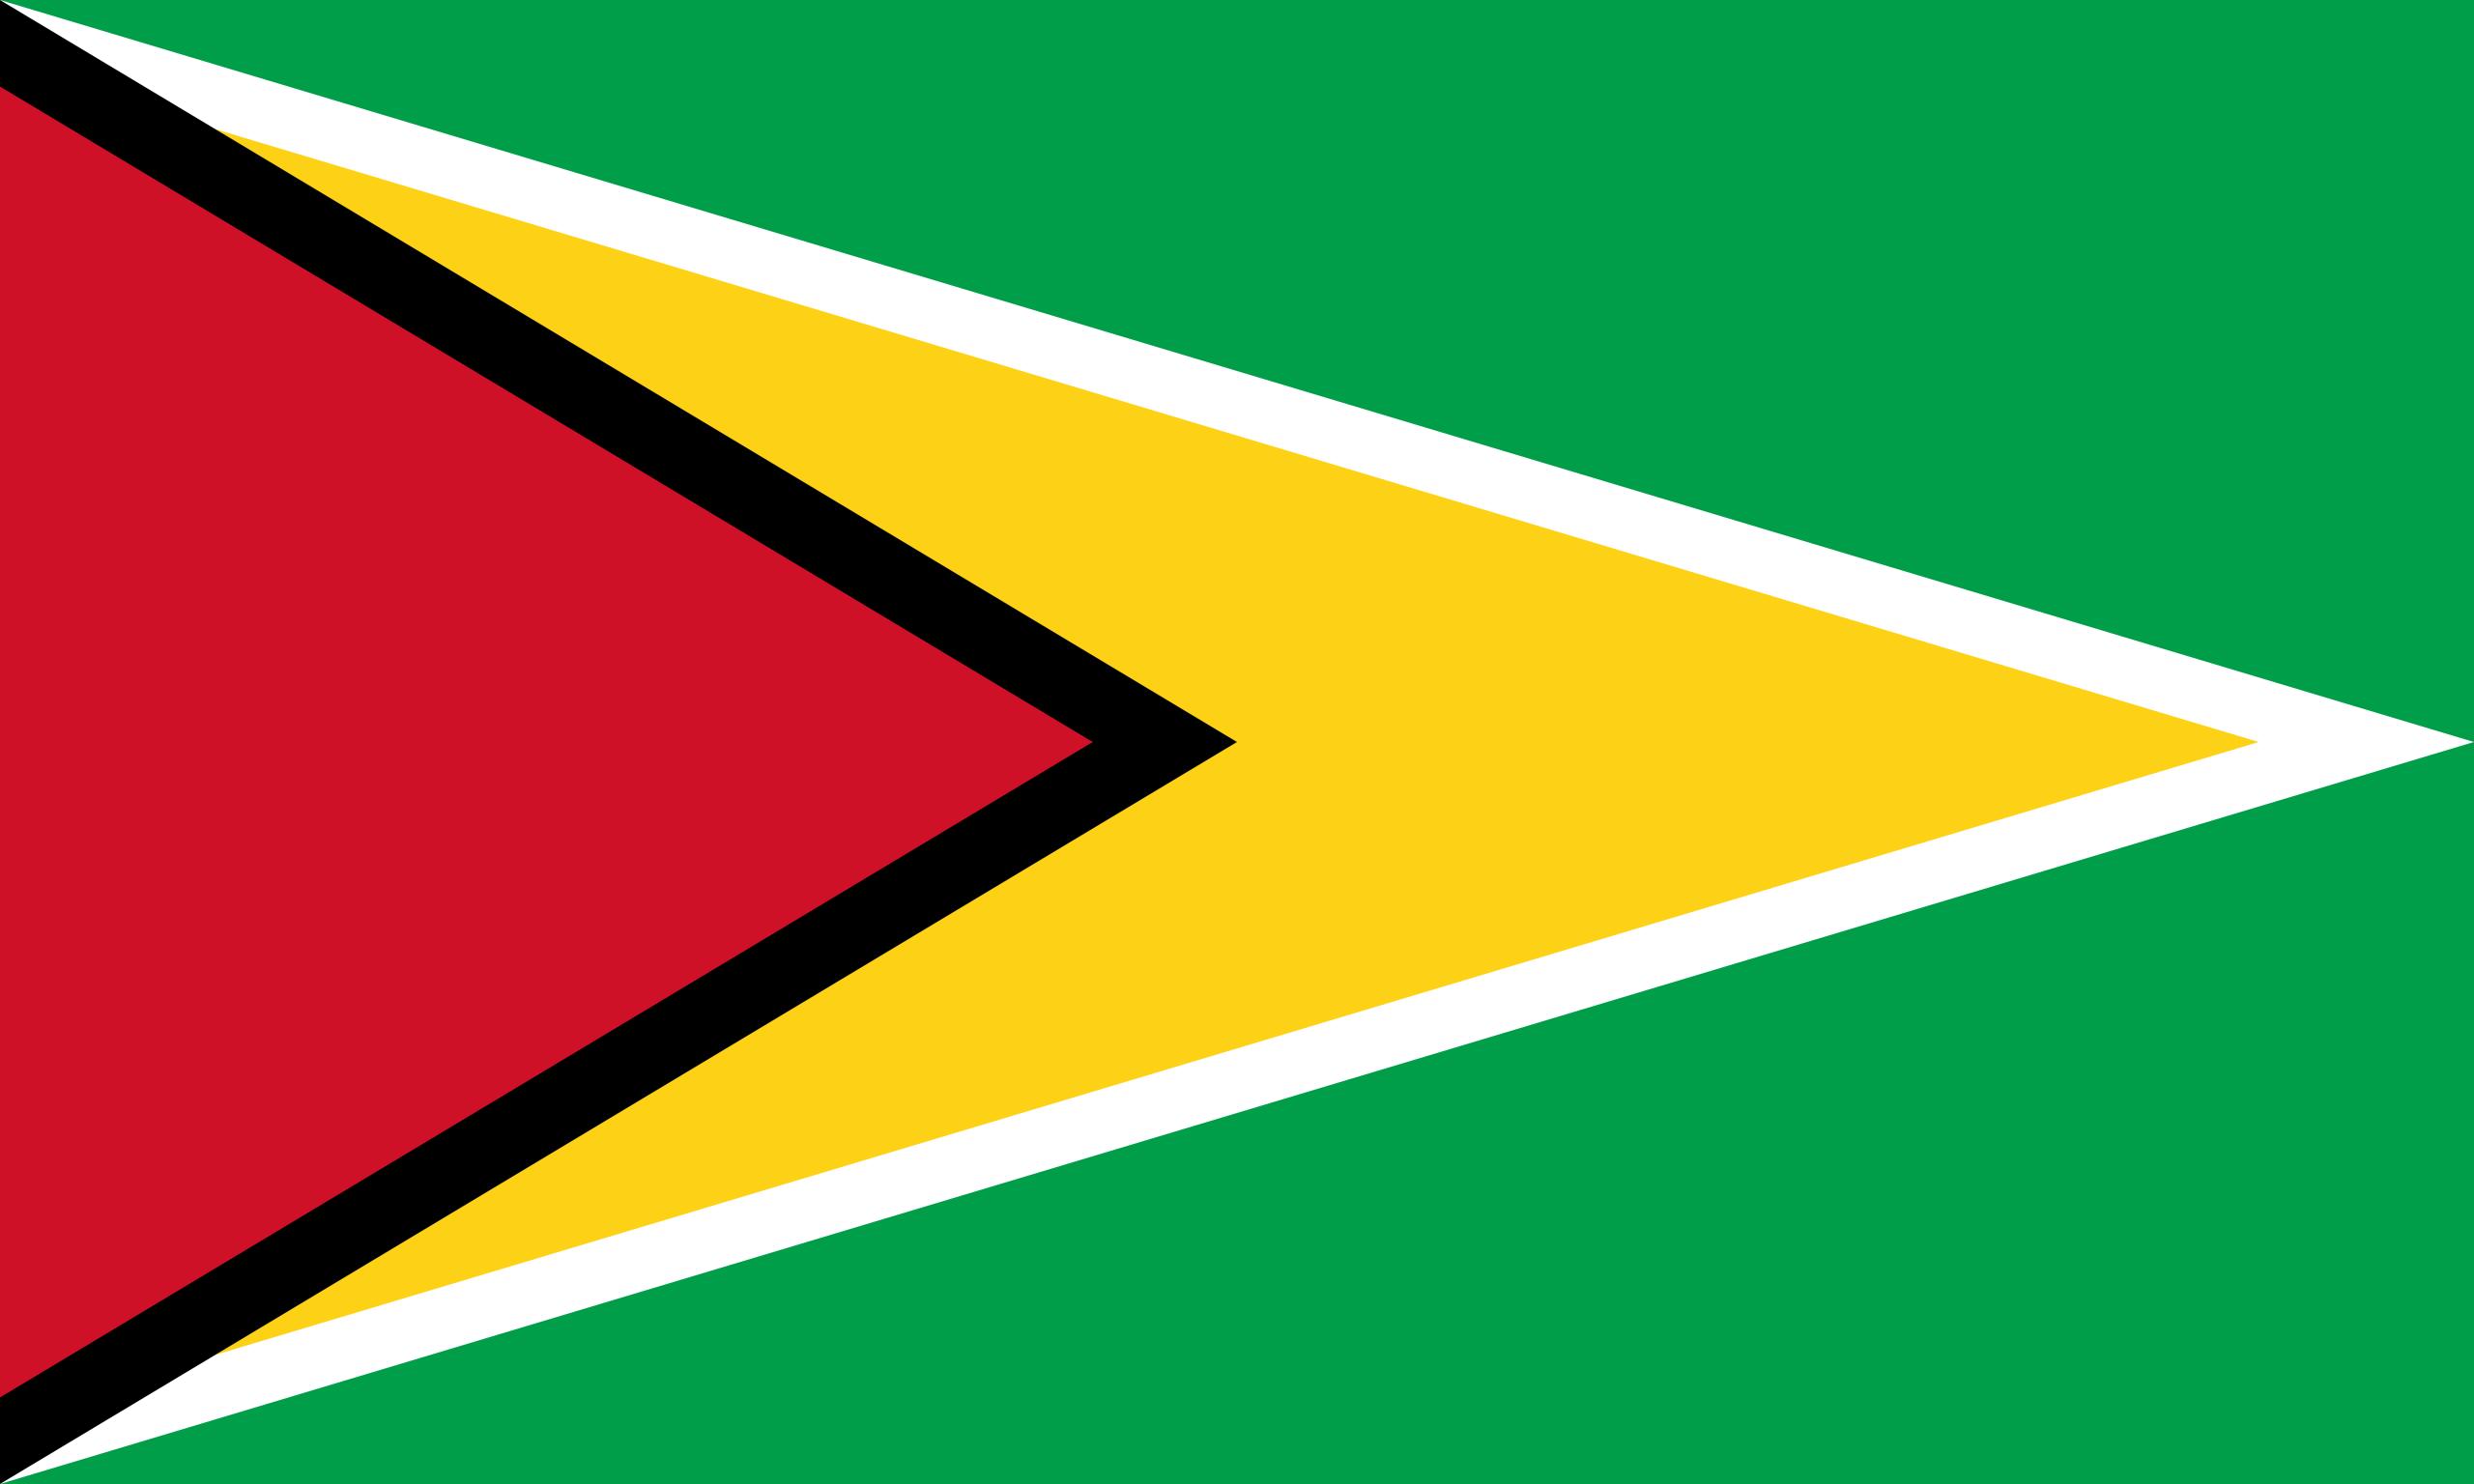 guyana, देश, emblema, लोग�प्रतीकbolo - HD वॉलपेपर - प्रोफेसर-falken.com